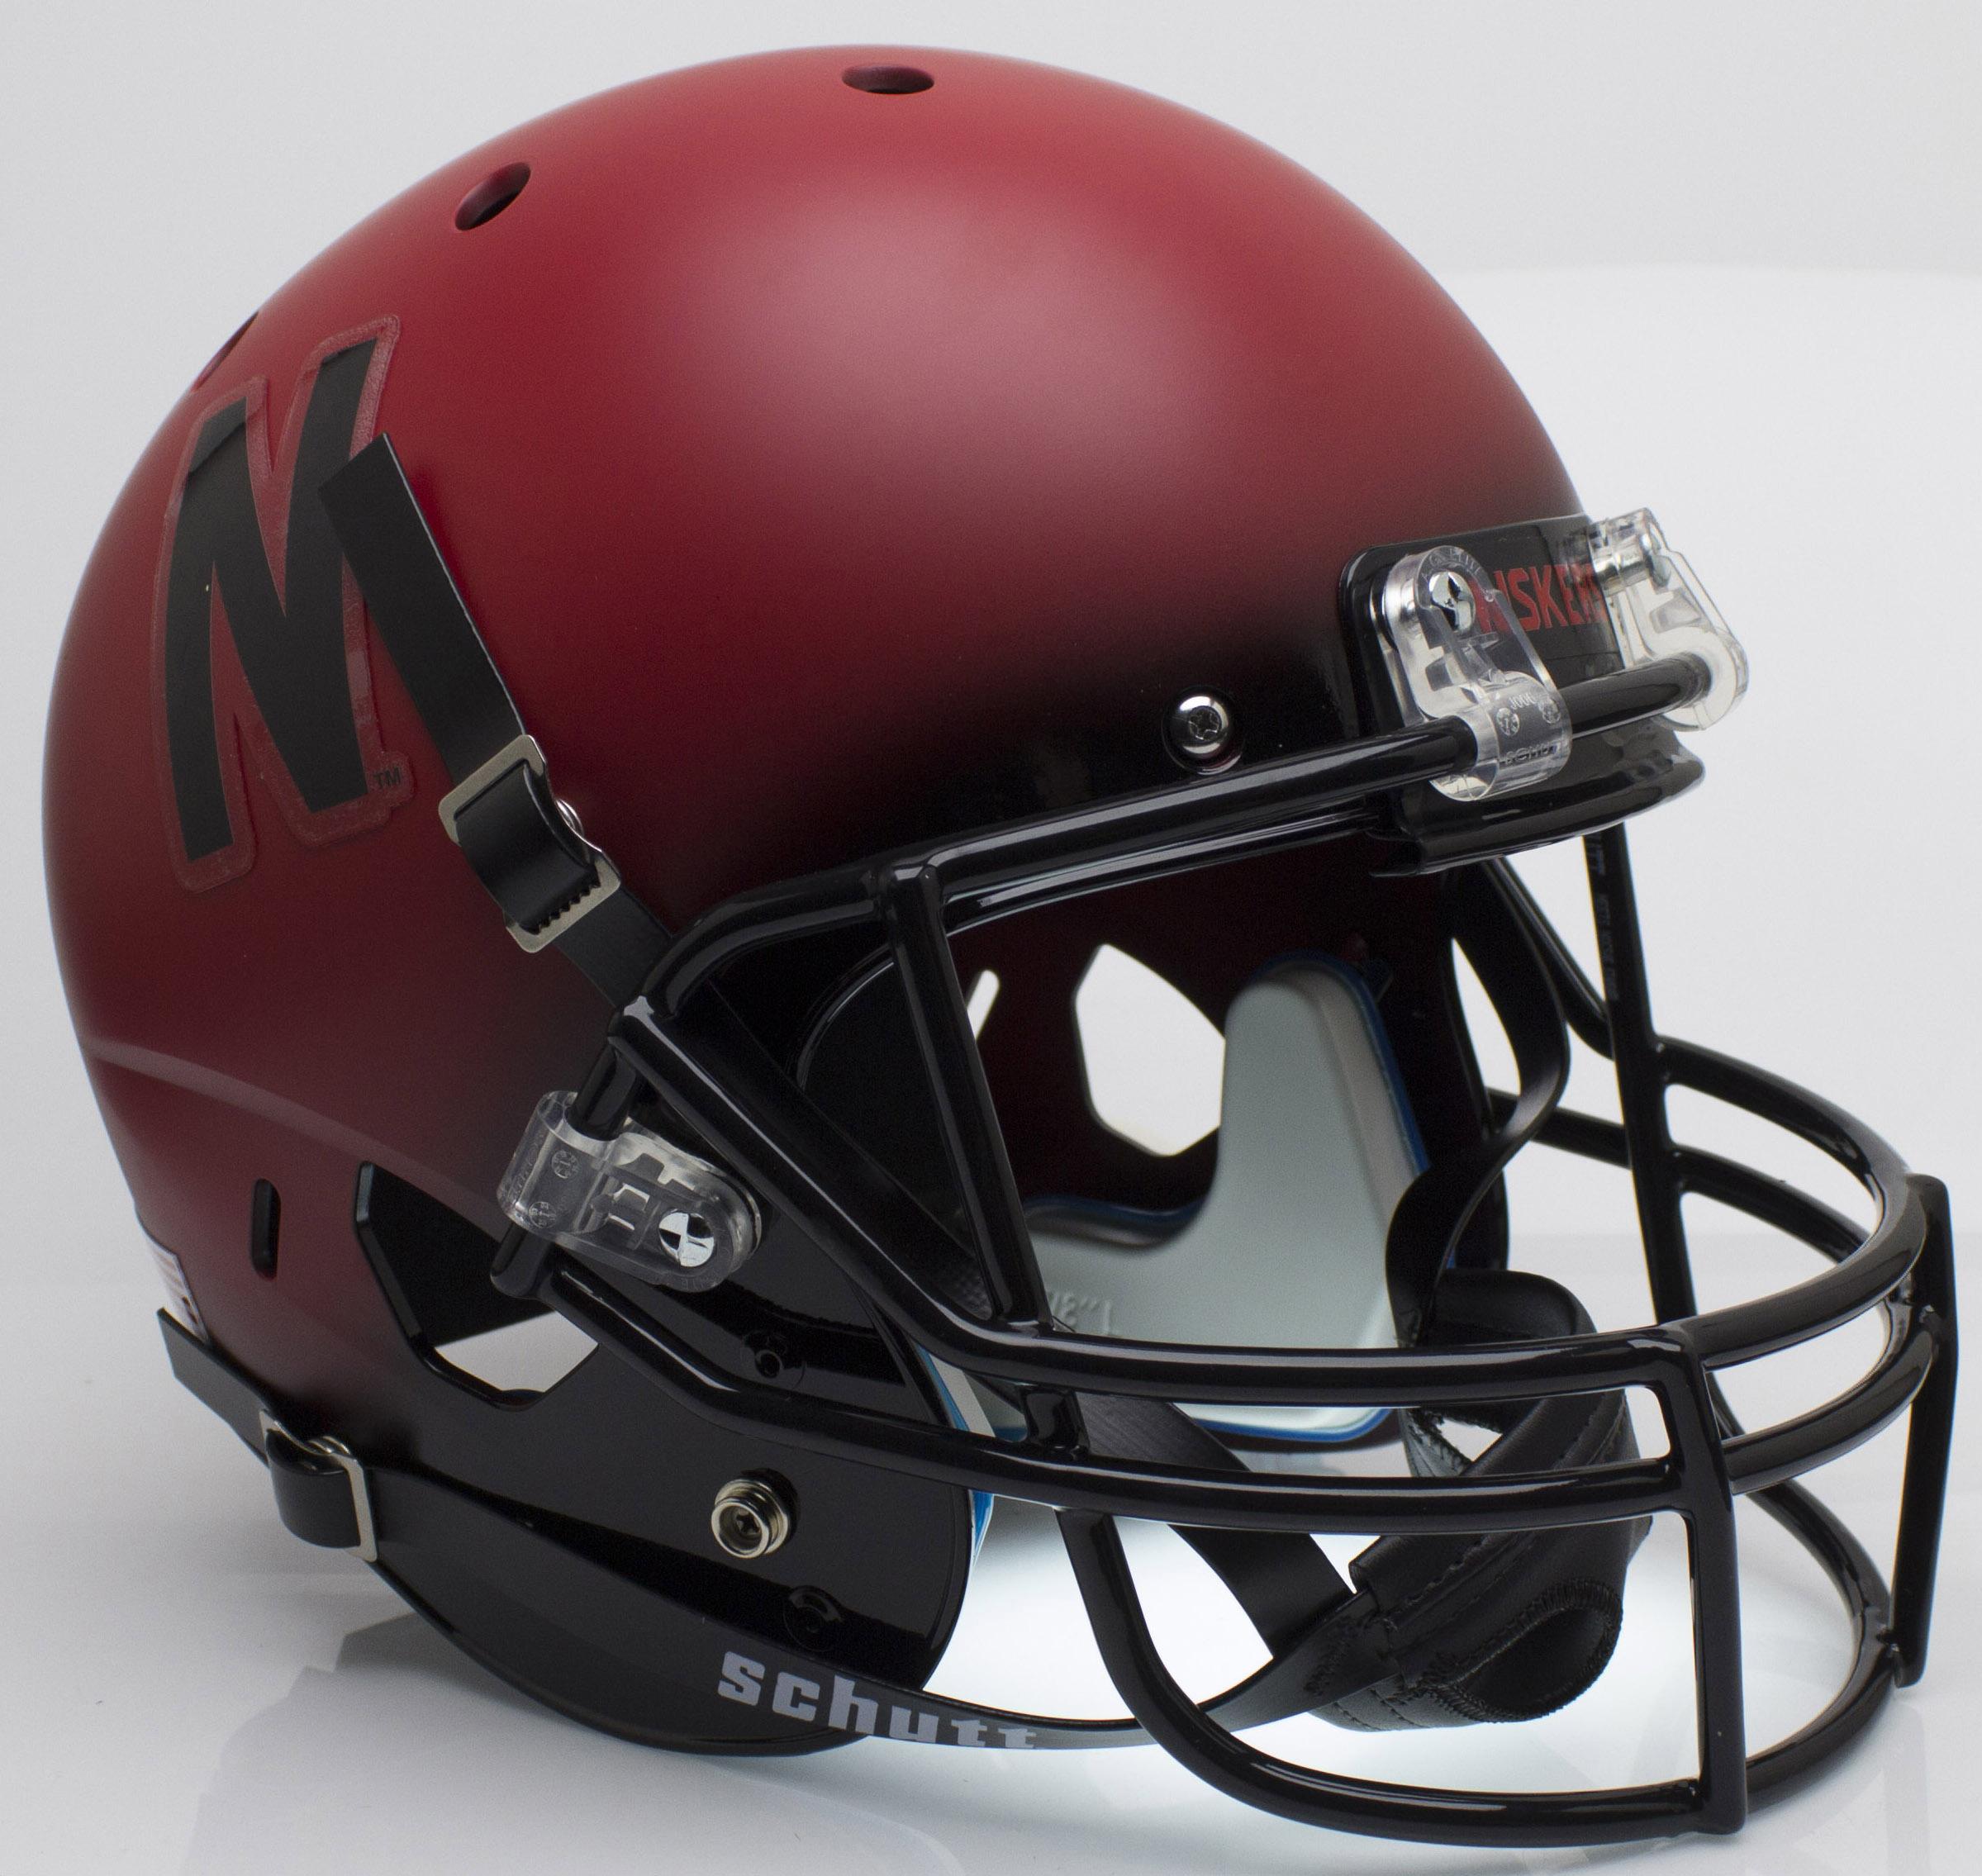 Nebraska Cornhuskers Full XP Replica Football Helmet Schutt <B>Red and Black</B>